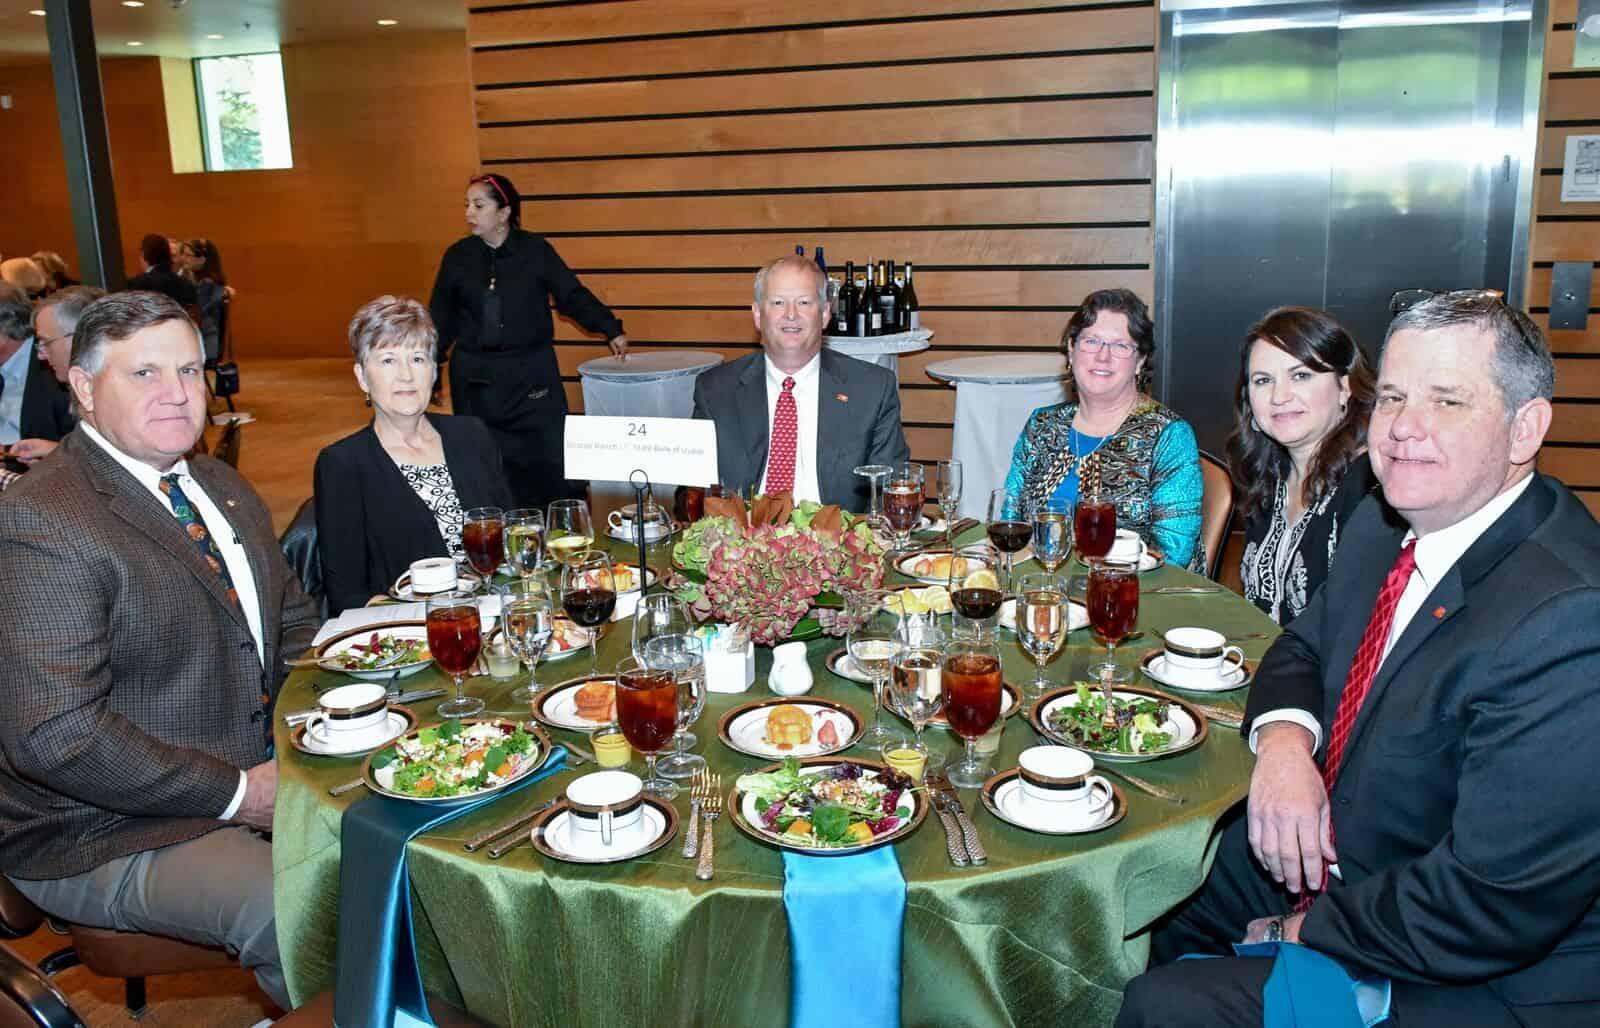 Tommy Leonard, Revis Leonard, Roy and Carol Kothmann, Lisa Parker and Cody Smith